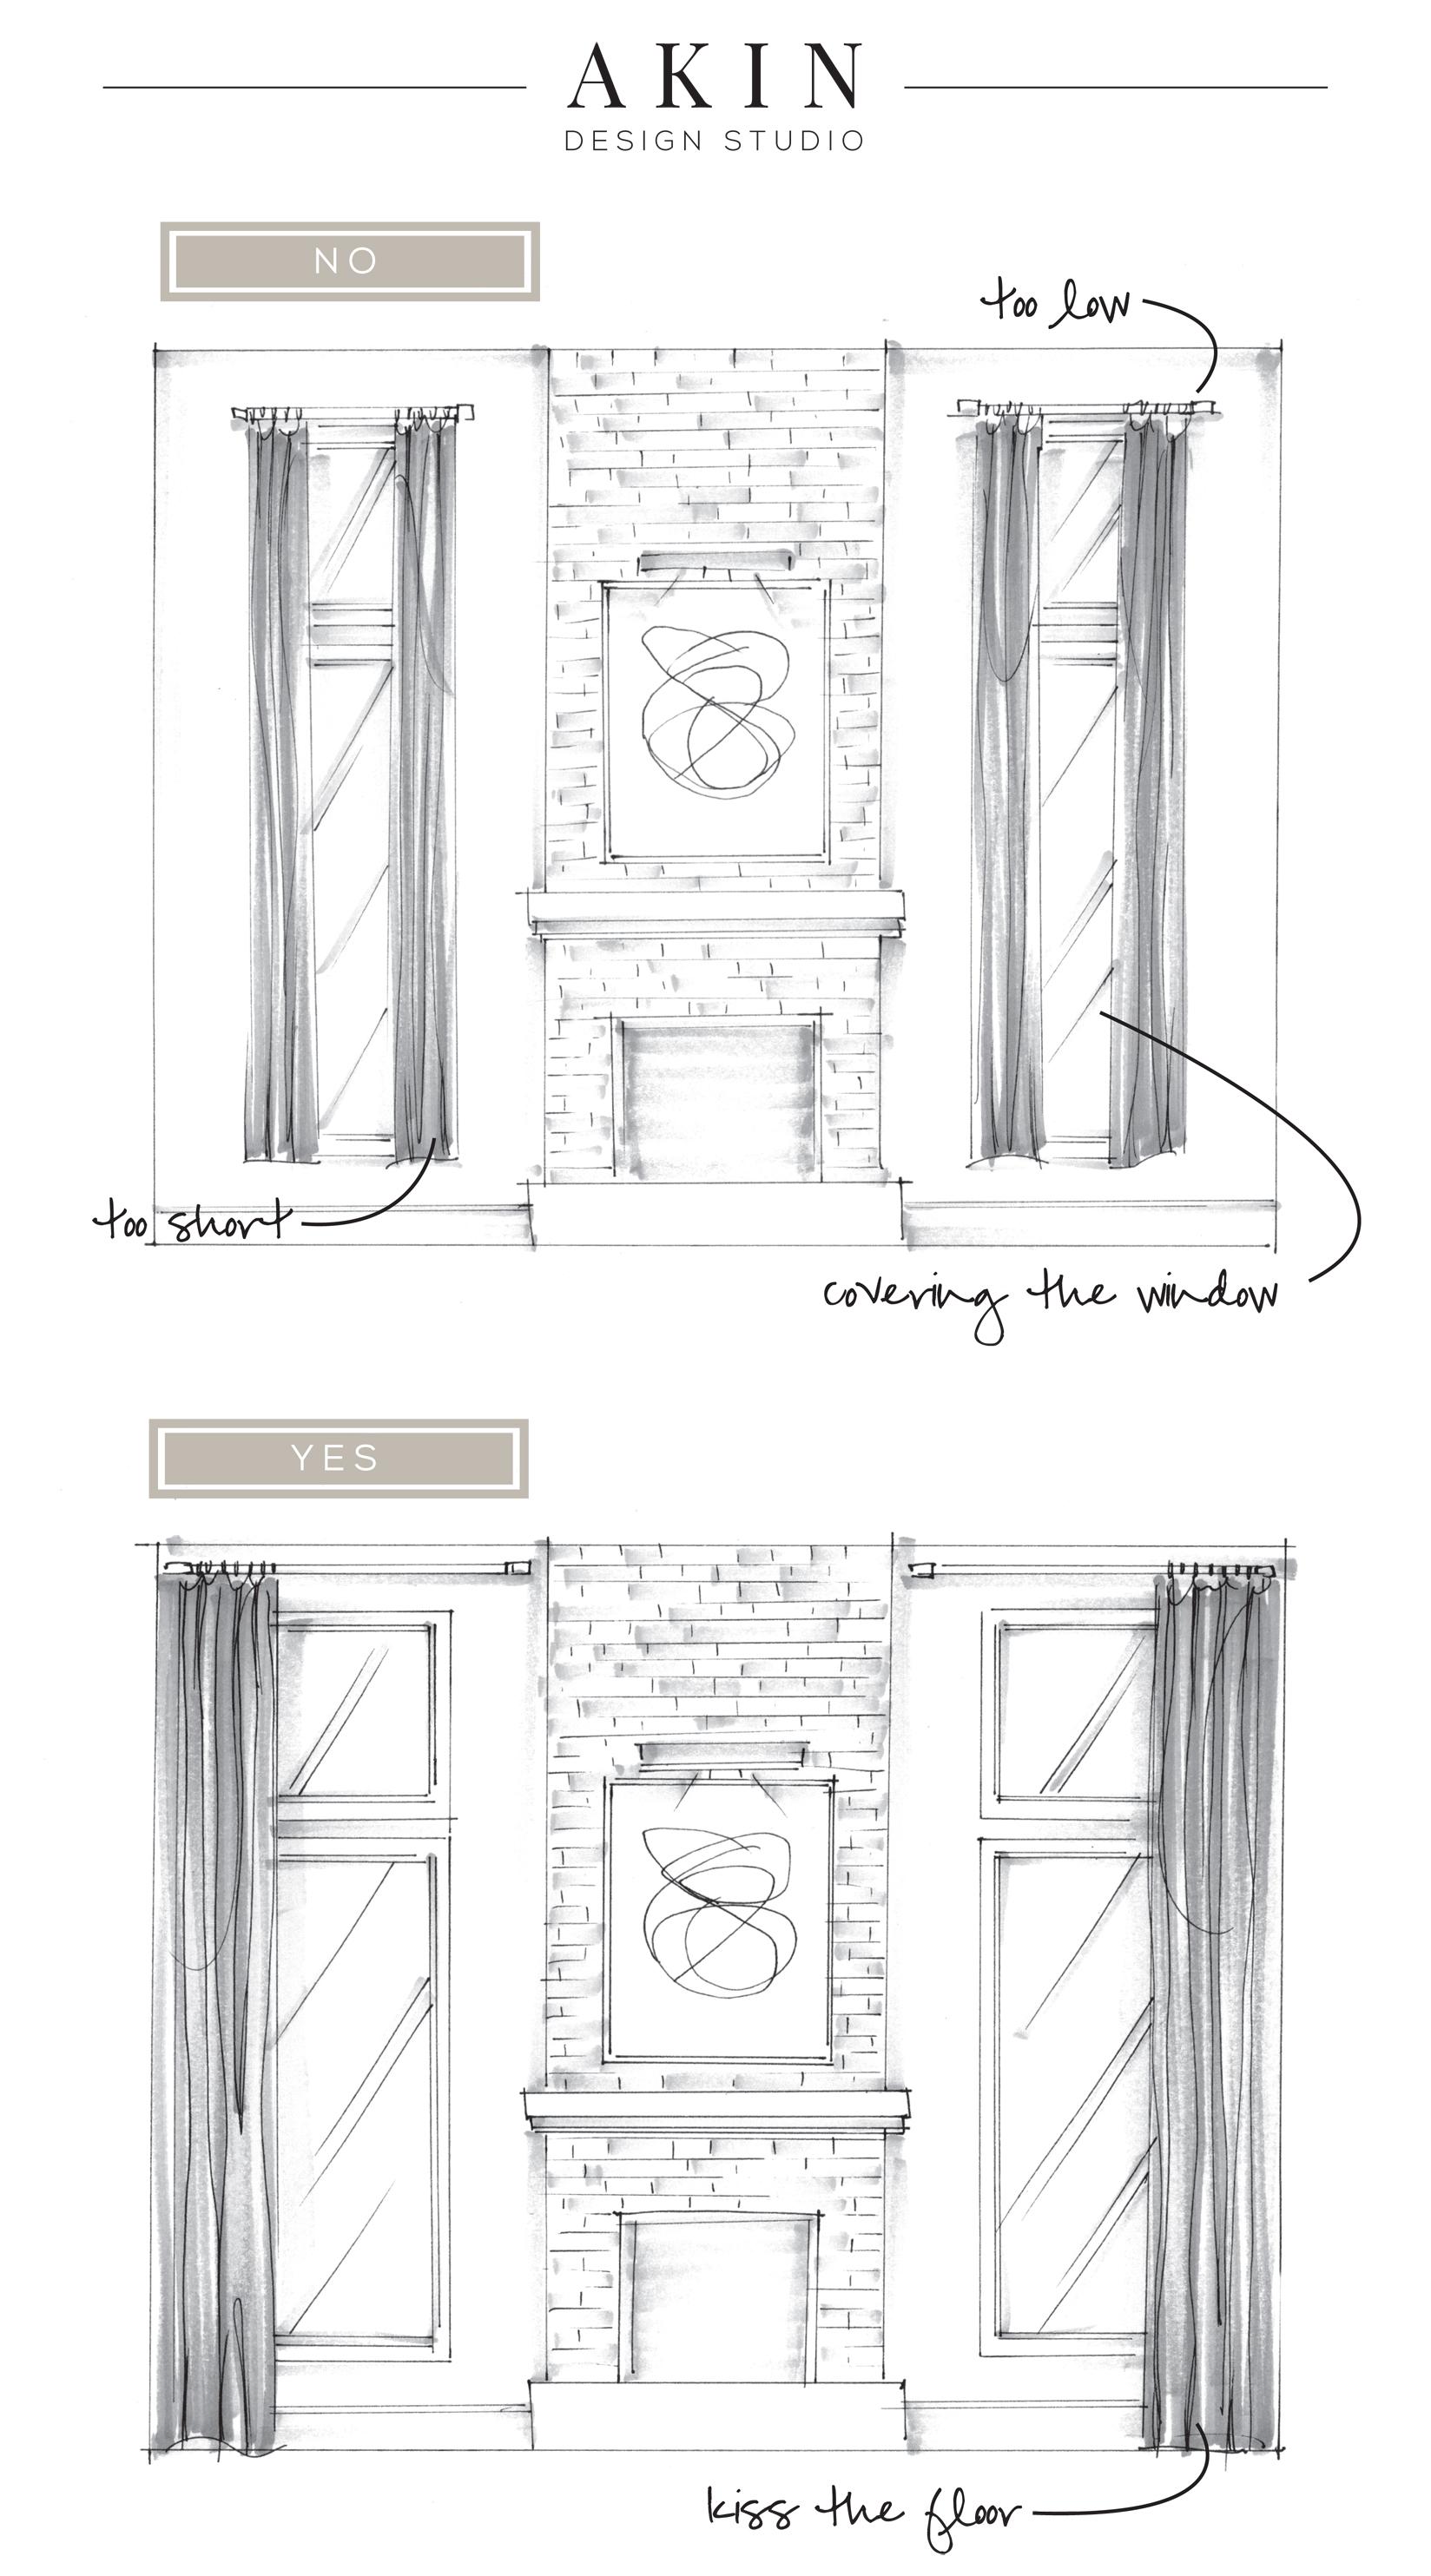 How to hang drapery panels | Akin Design Studio Blog